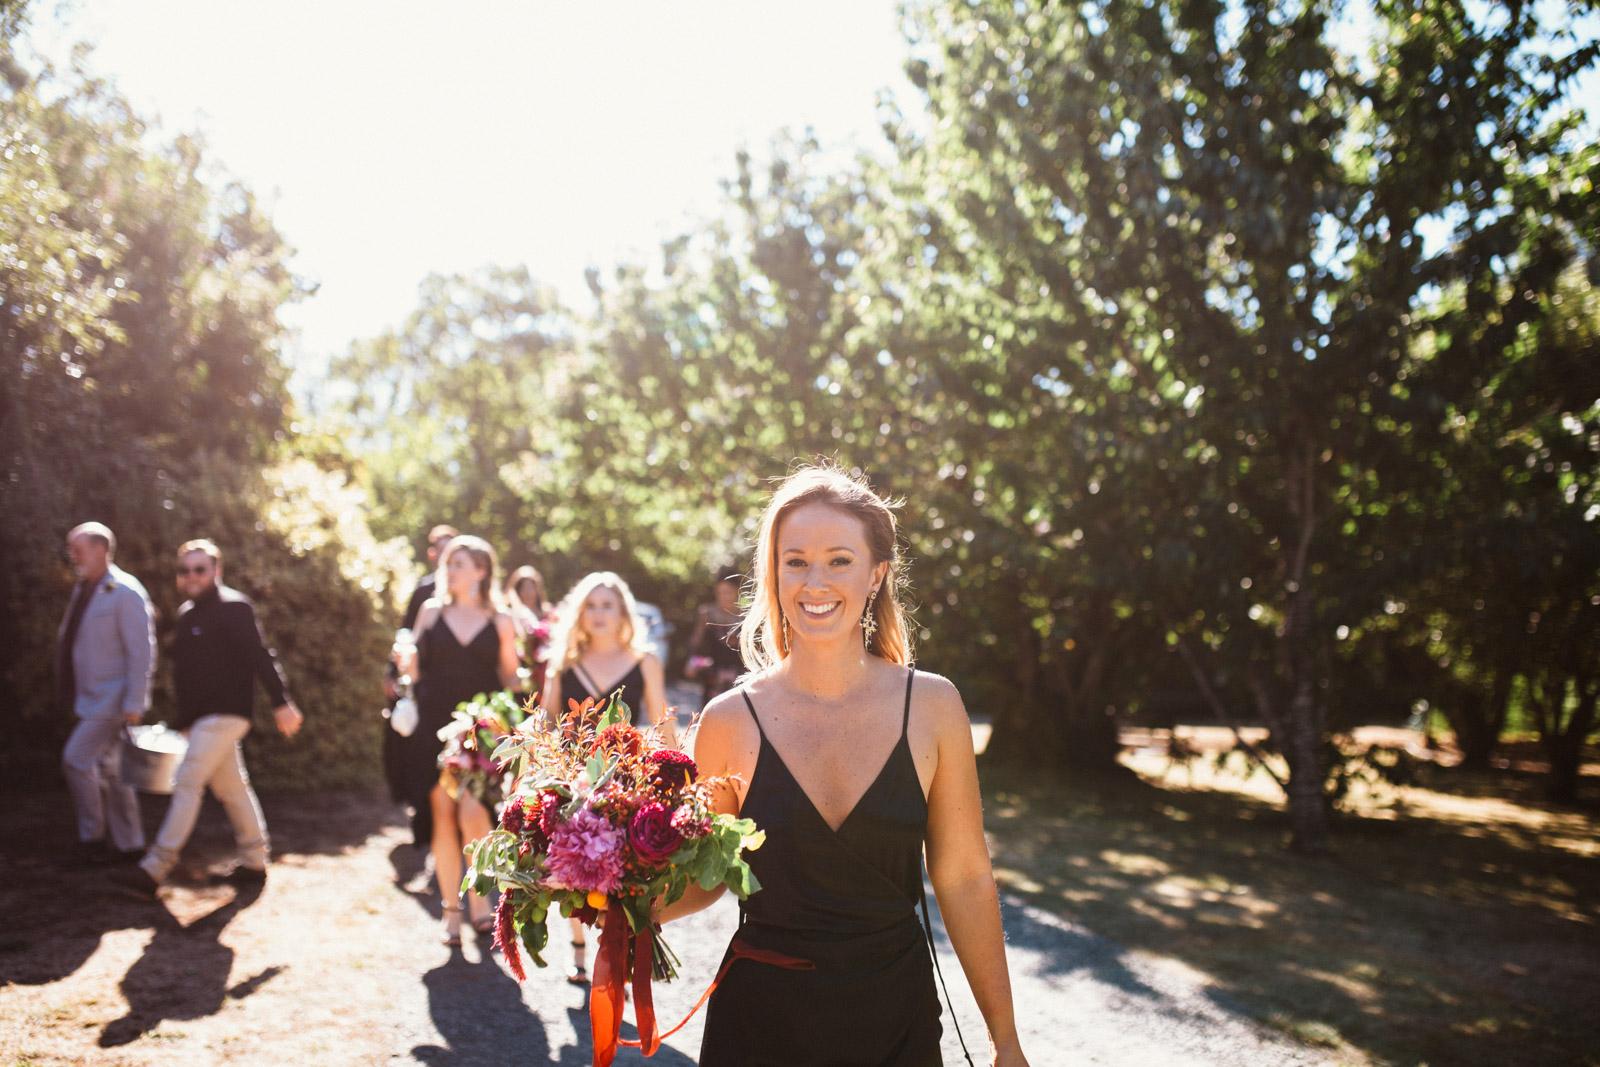 ZD-Melbourne Wedding Photographer-Dean Raphael-63.jpg